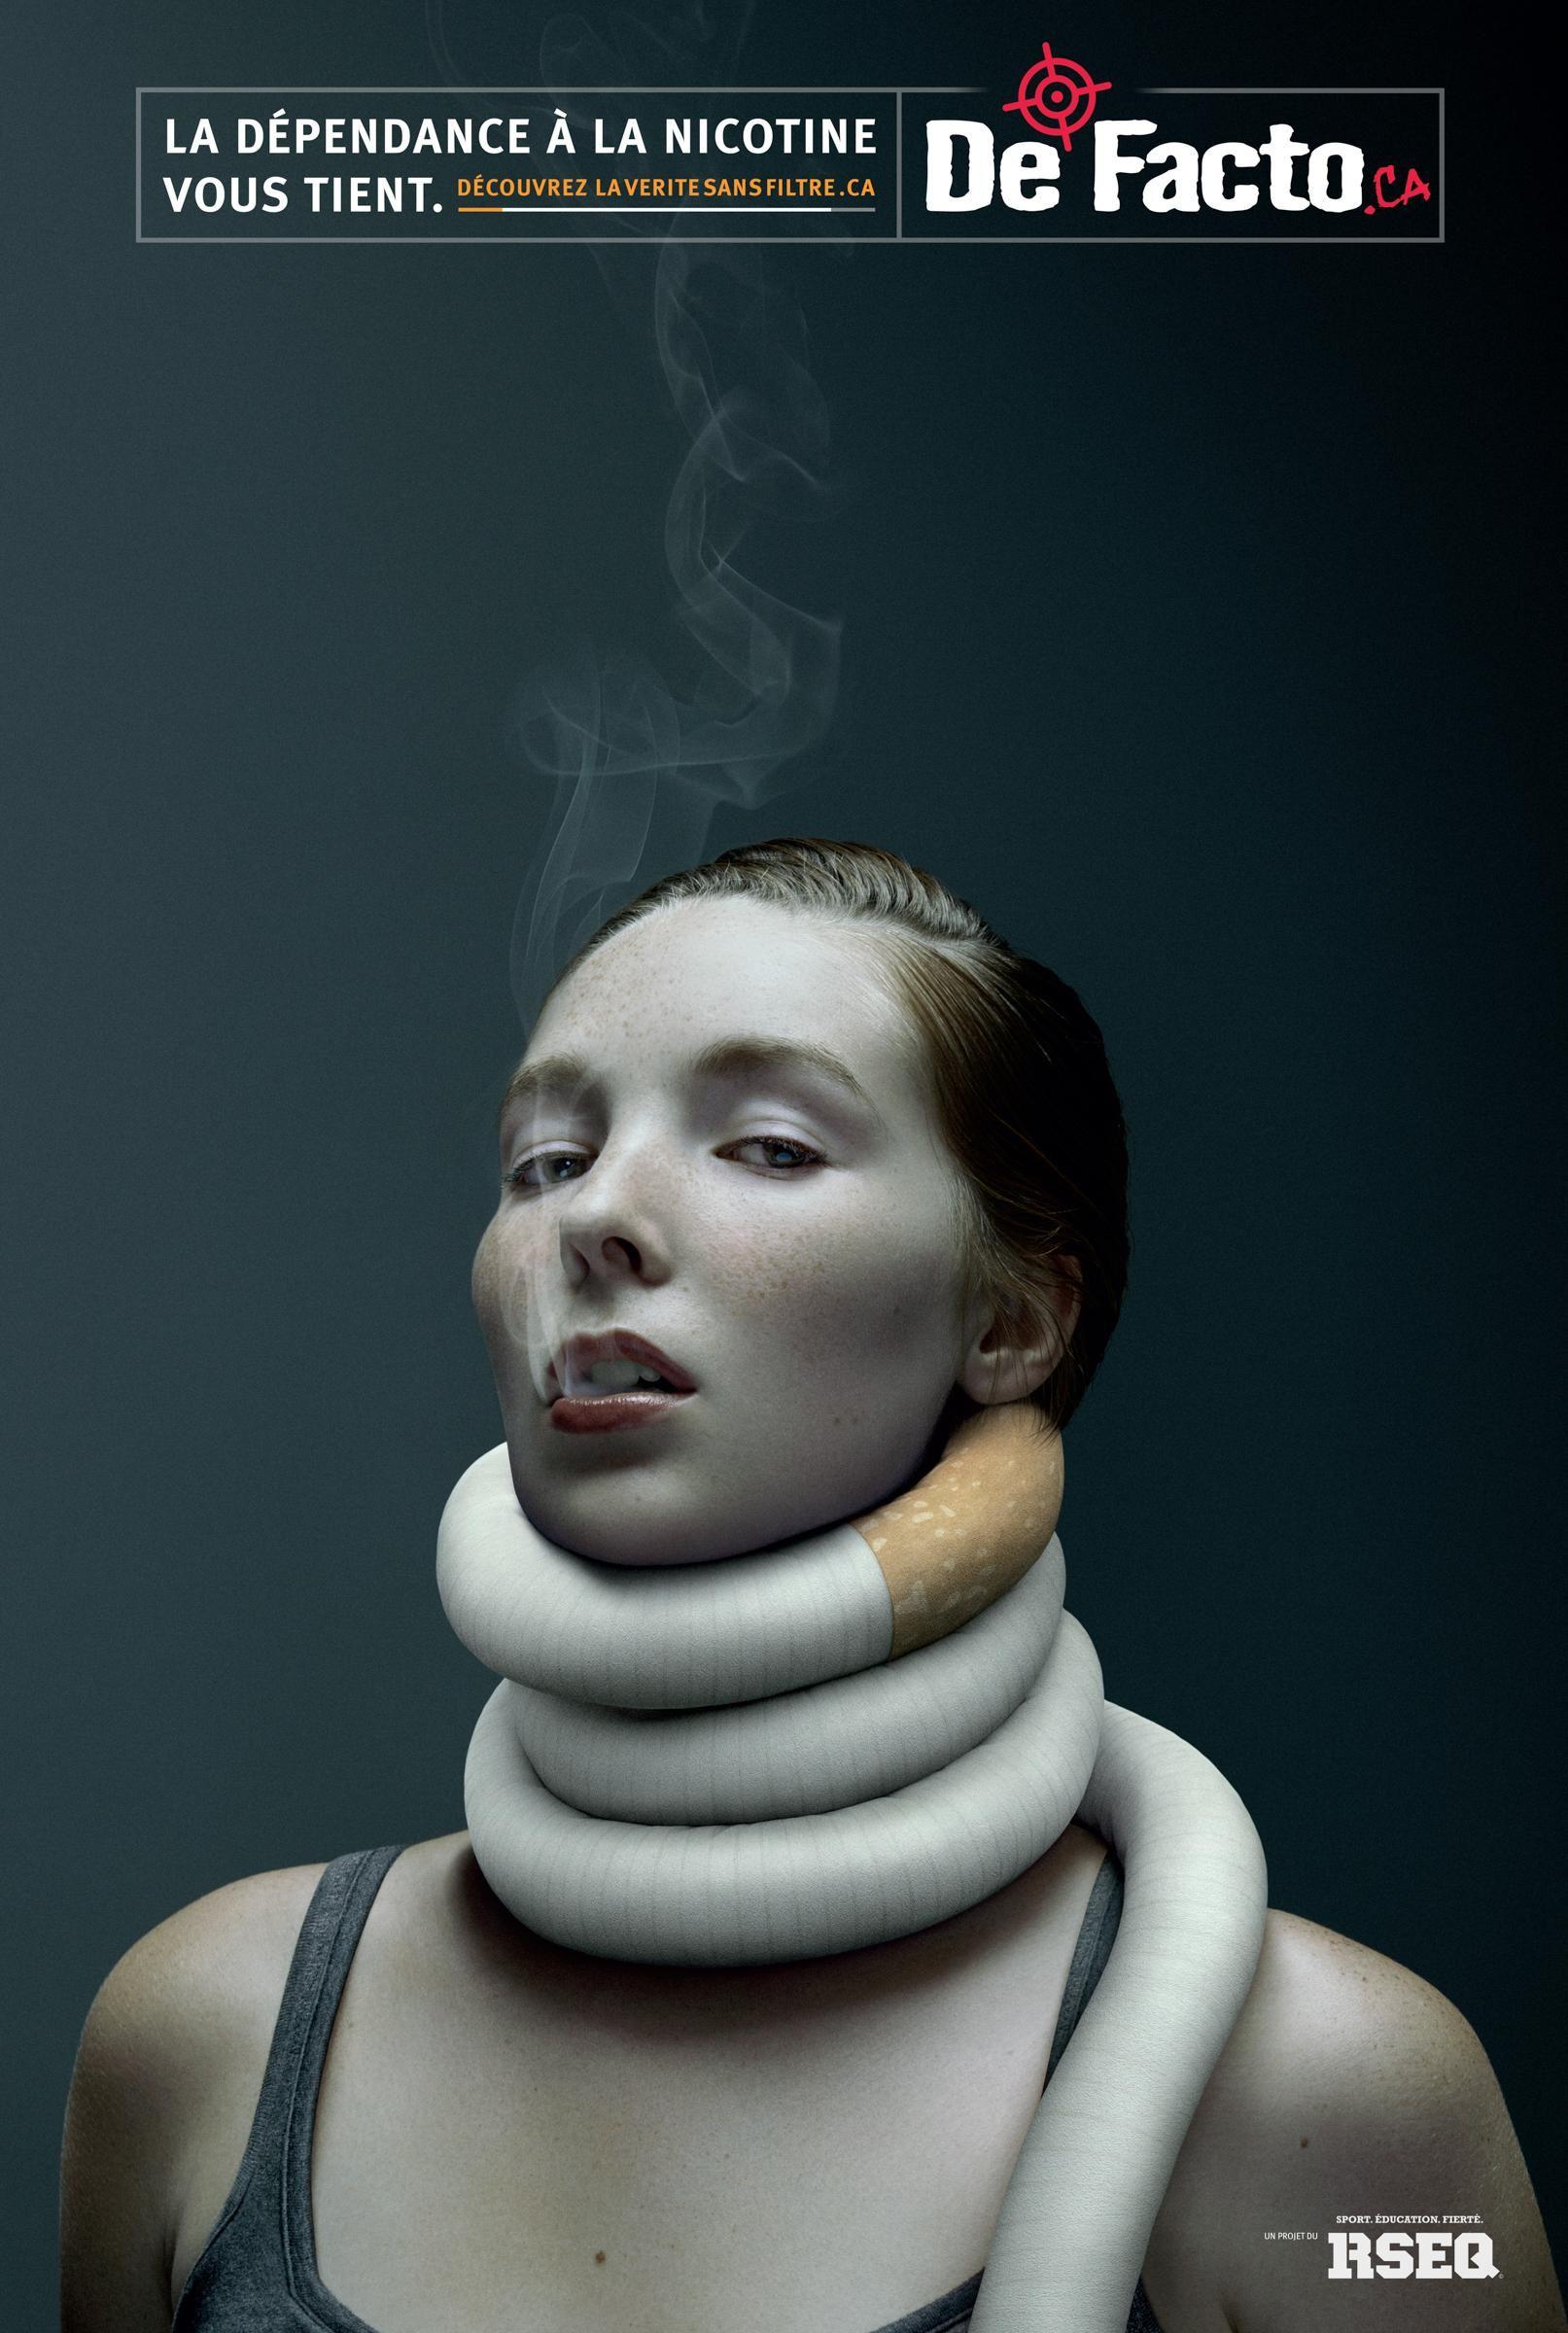 ded4dbf381 De Facto  Nicotine addiction - woman